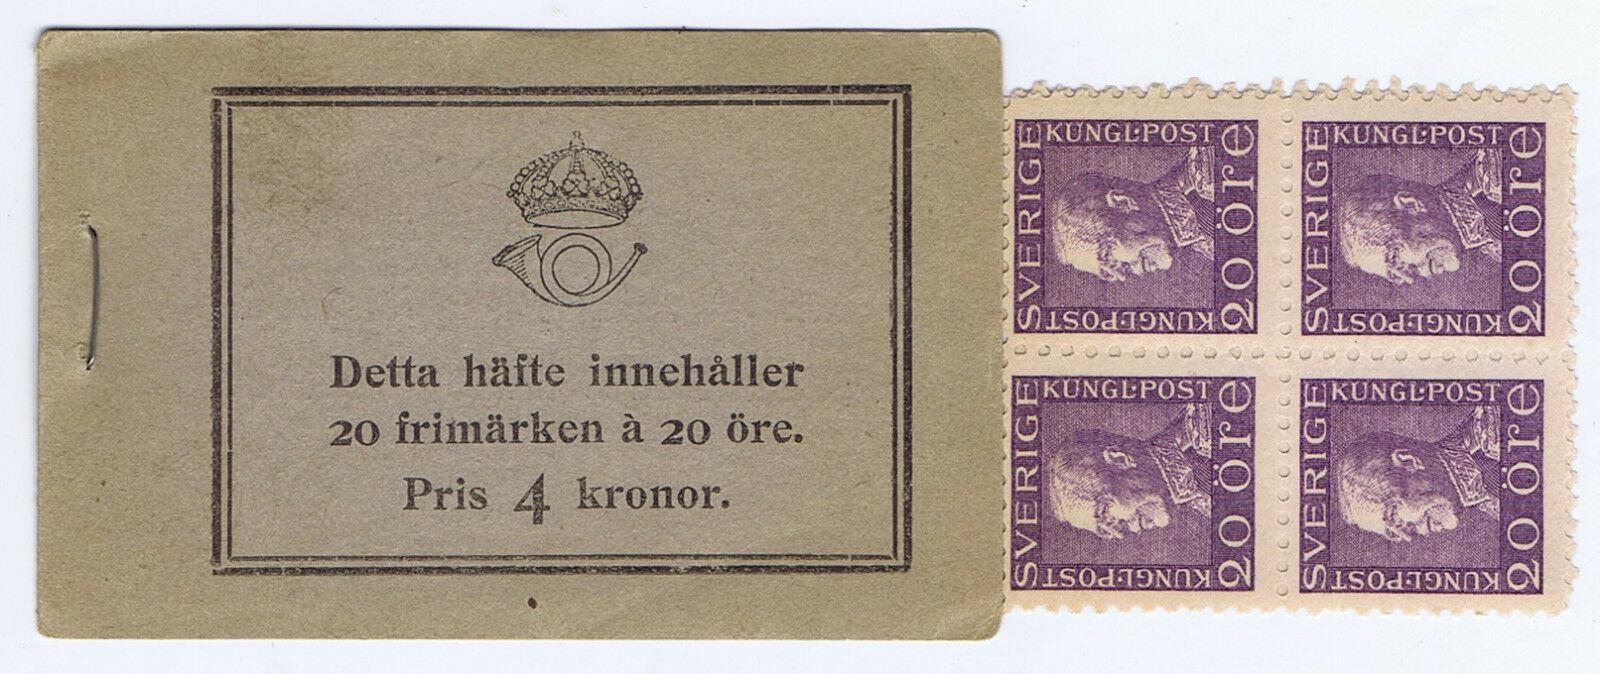 WHOLESALE - 5 SWEDEN 4 KRONER BOOKLETS of 20 ORE STAMPS SC # 170 MNH of 1921